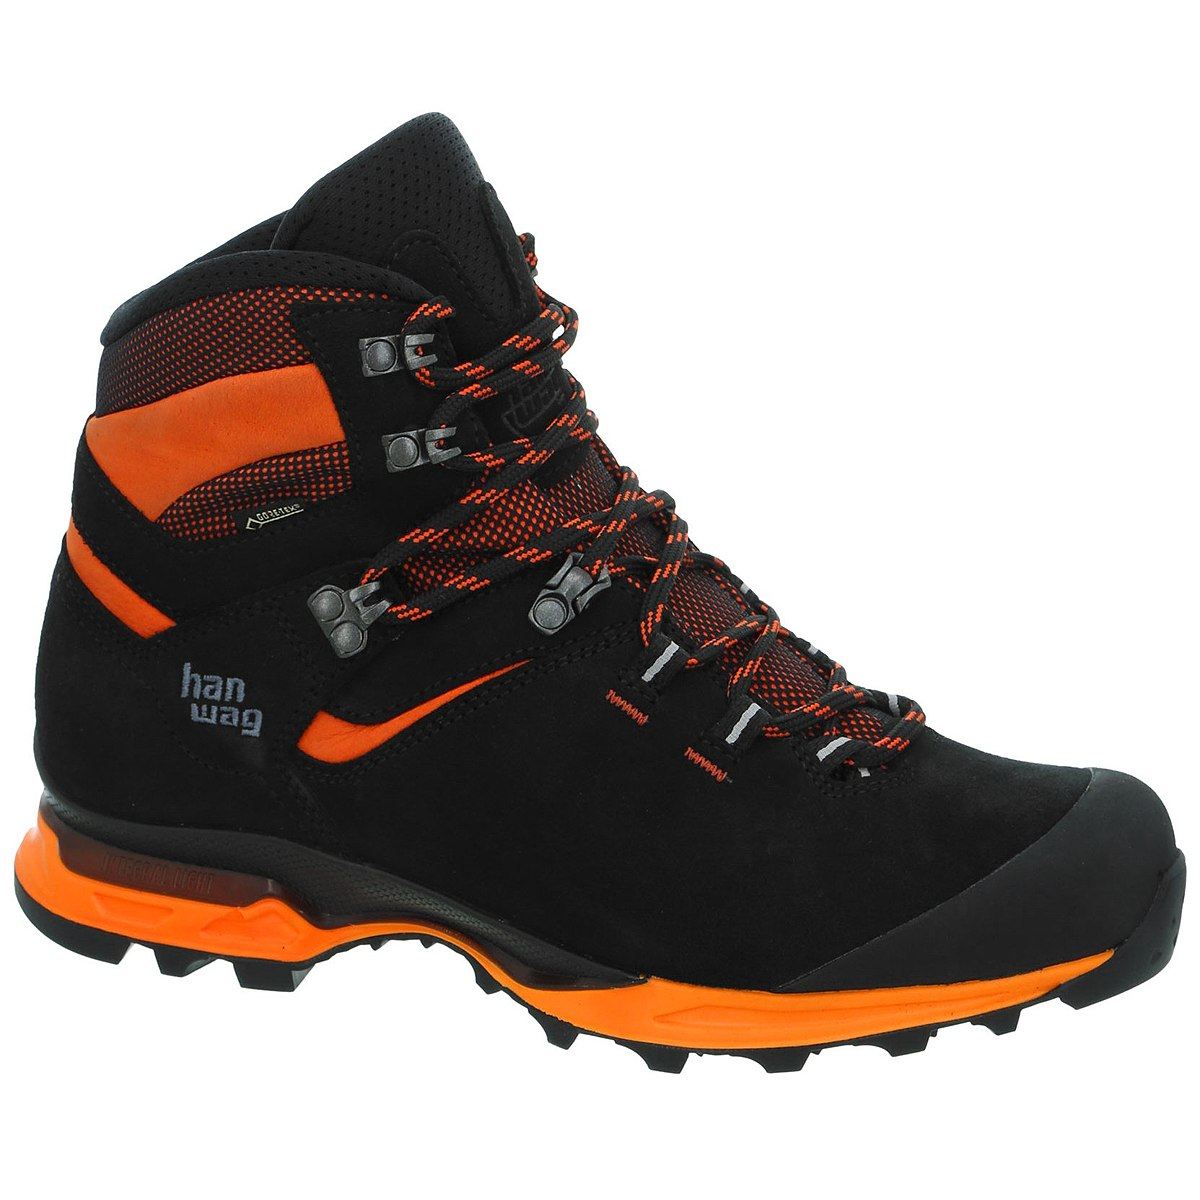 Hanwag Tatra Light GTX Shoe - Black/Orange